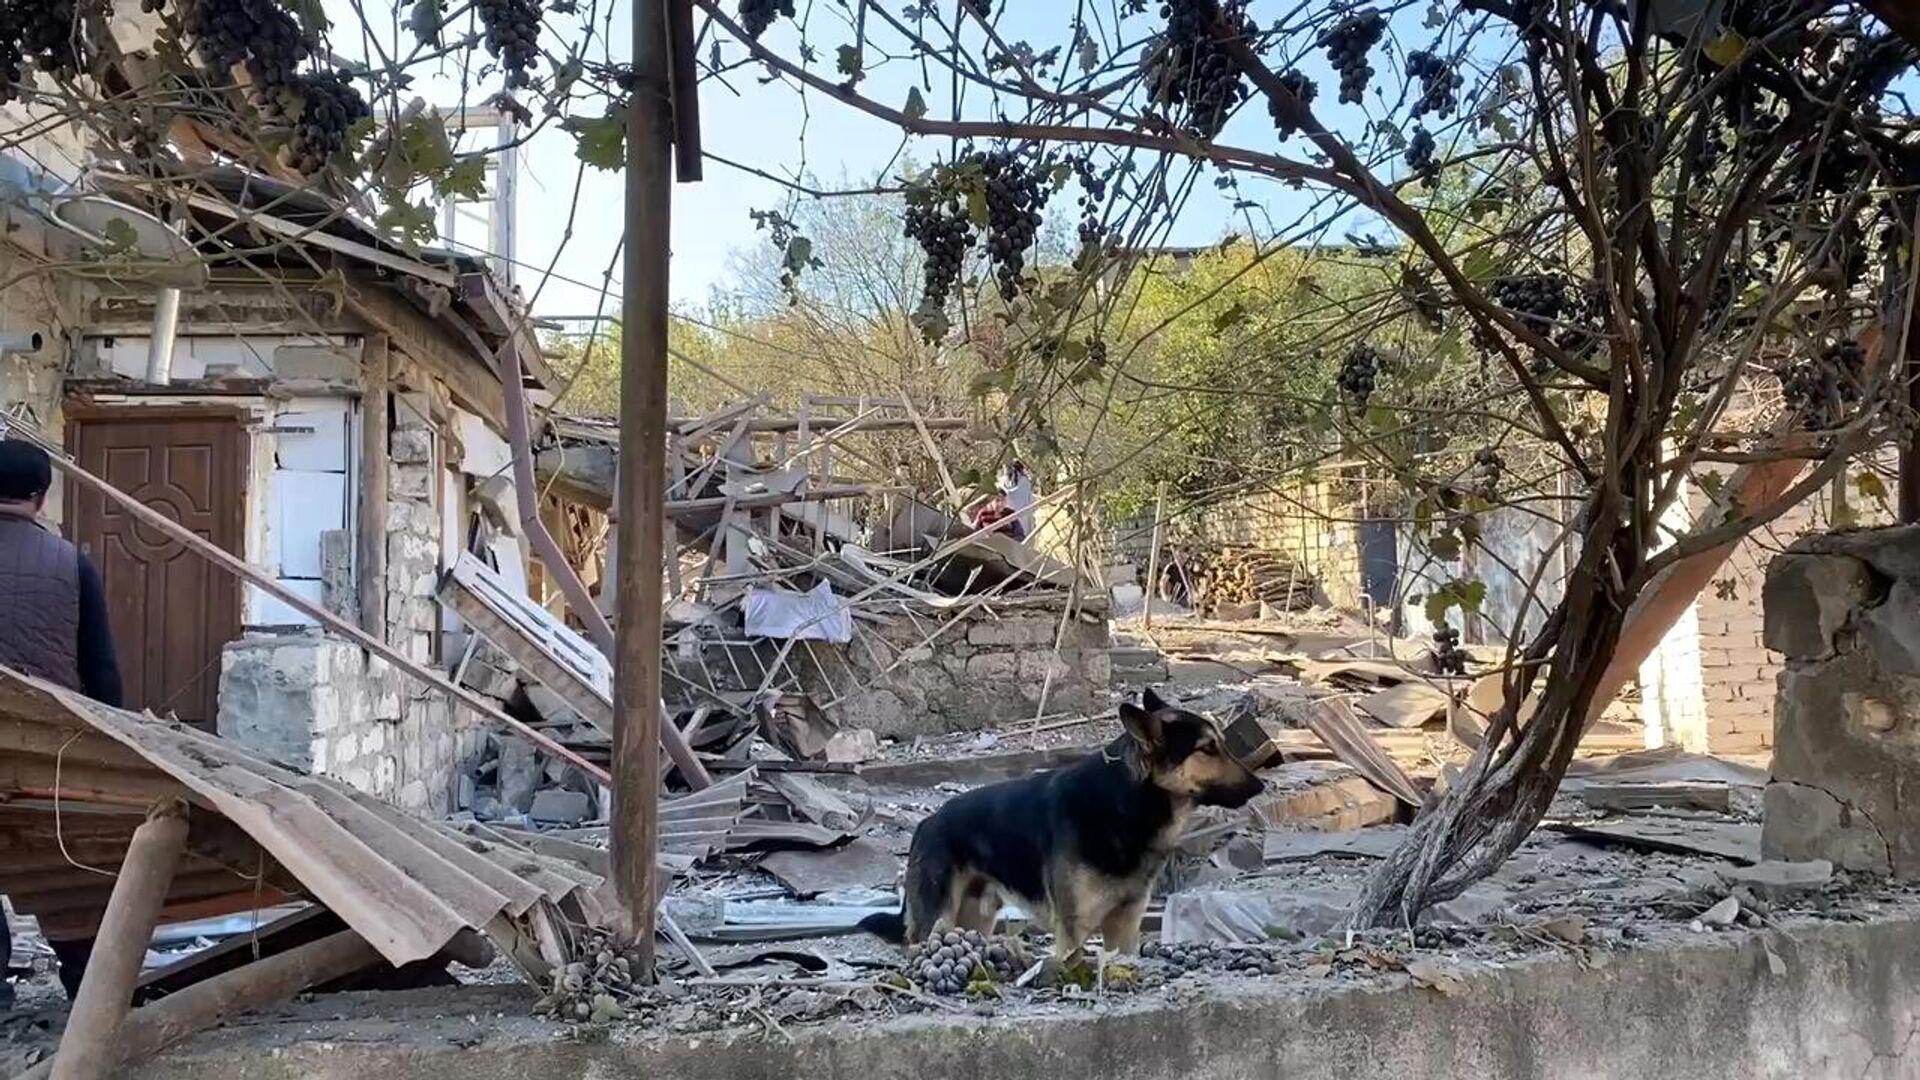 1580244736 0:0:1281:720 1920x0 80 0 0 4abb9865d87211faa19e318dbf74216c - В Карабахе заявили о готовности соблюдать перемирие